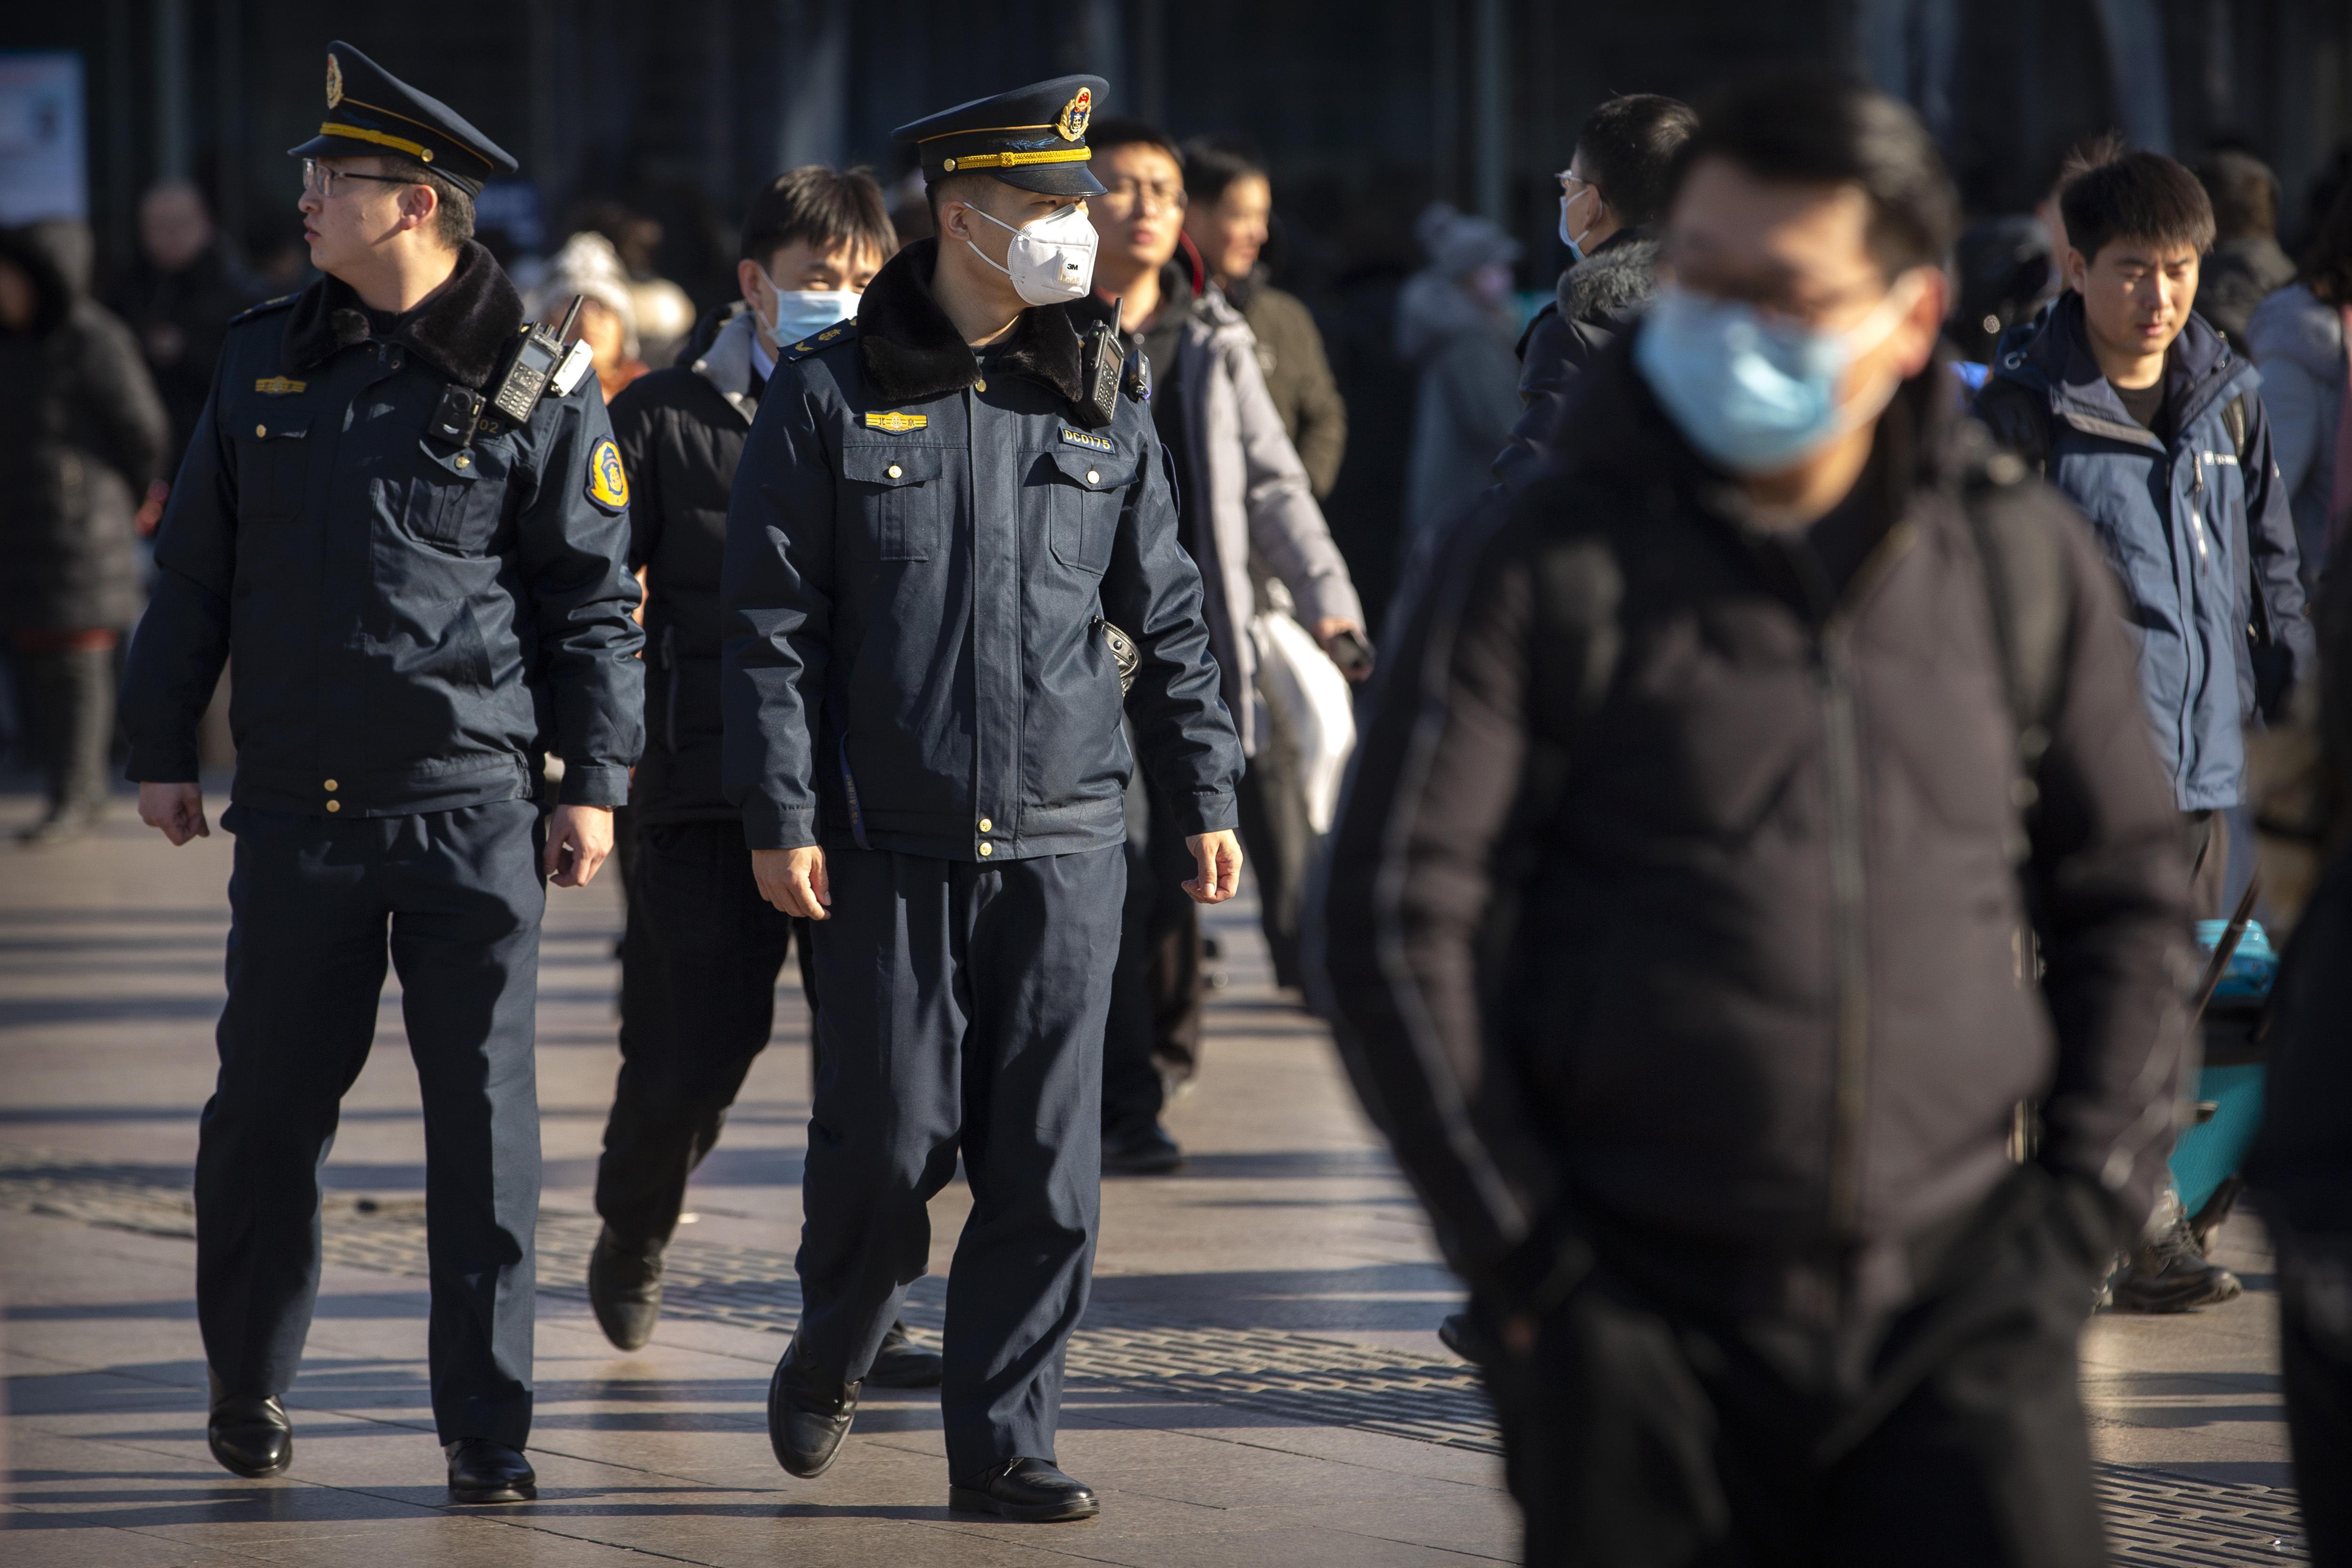 China's actions reveal seriousness of coronavirus